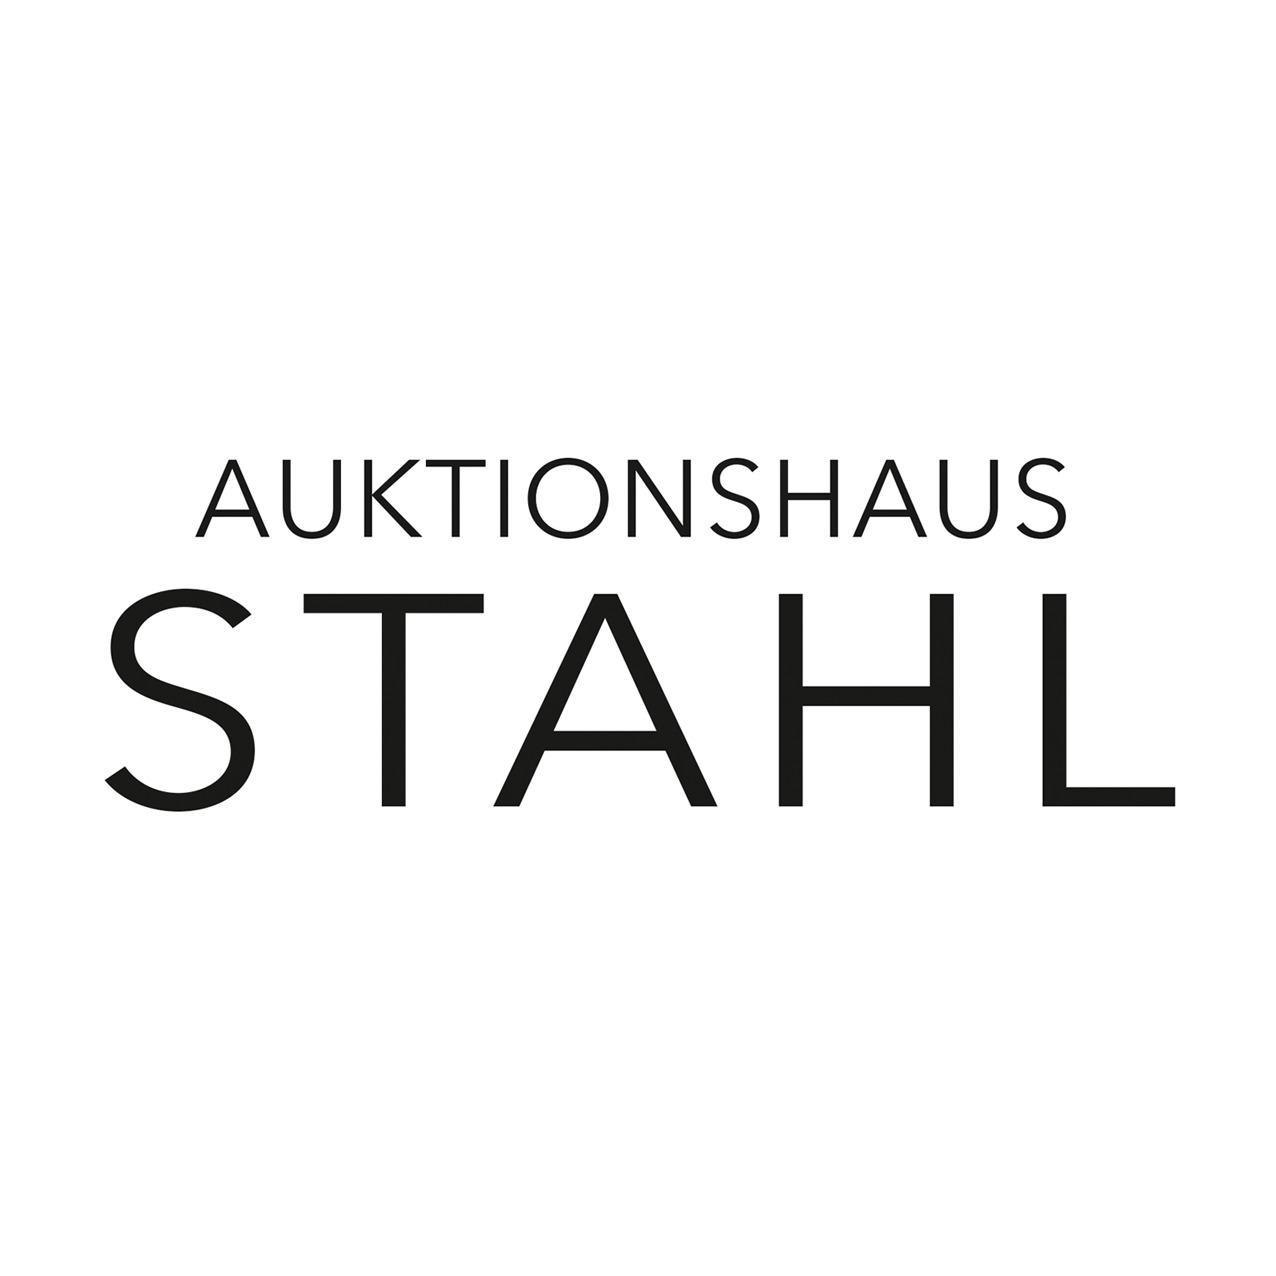 Auktionshaus Stahl GmbH & Co KG